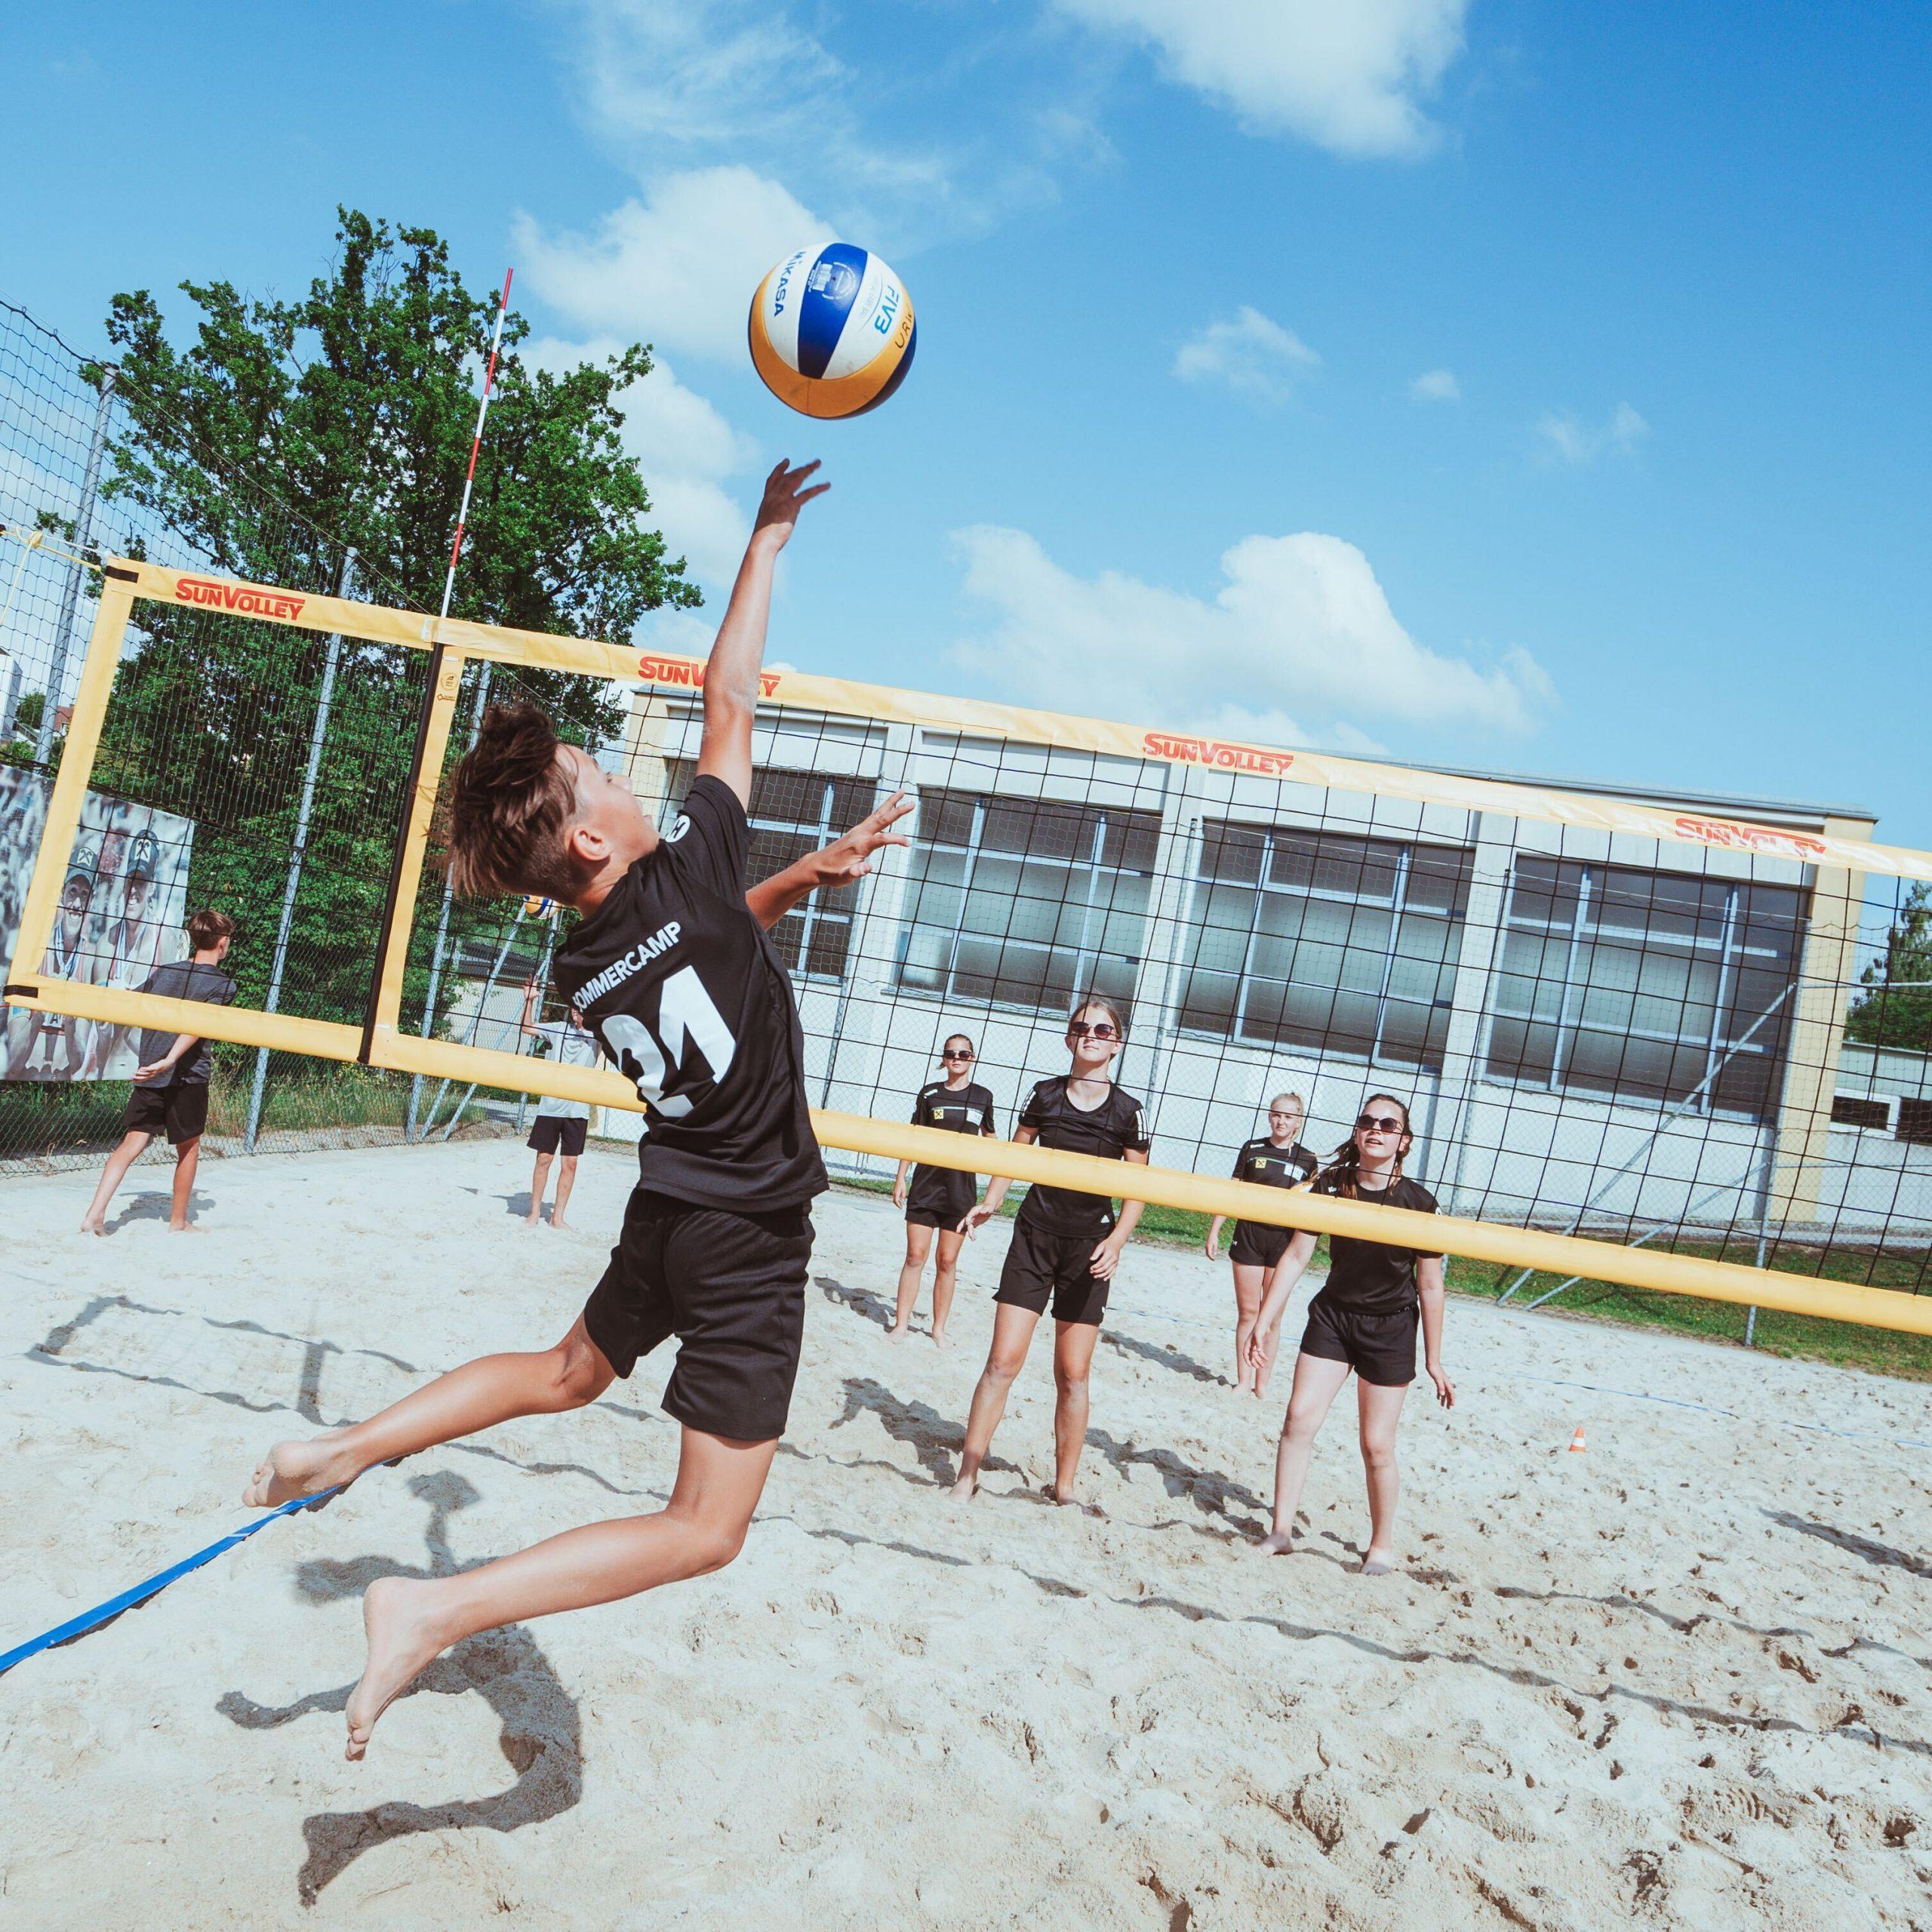 7 Tage Beachvolleyball-Action in Zwettl